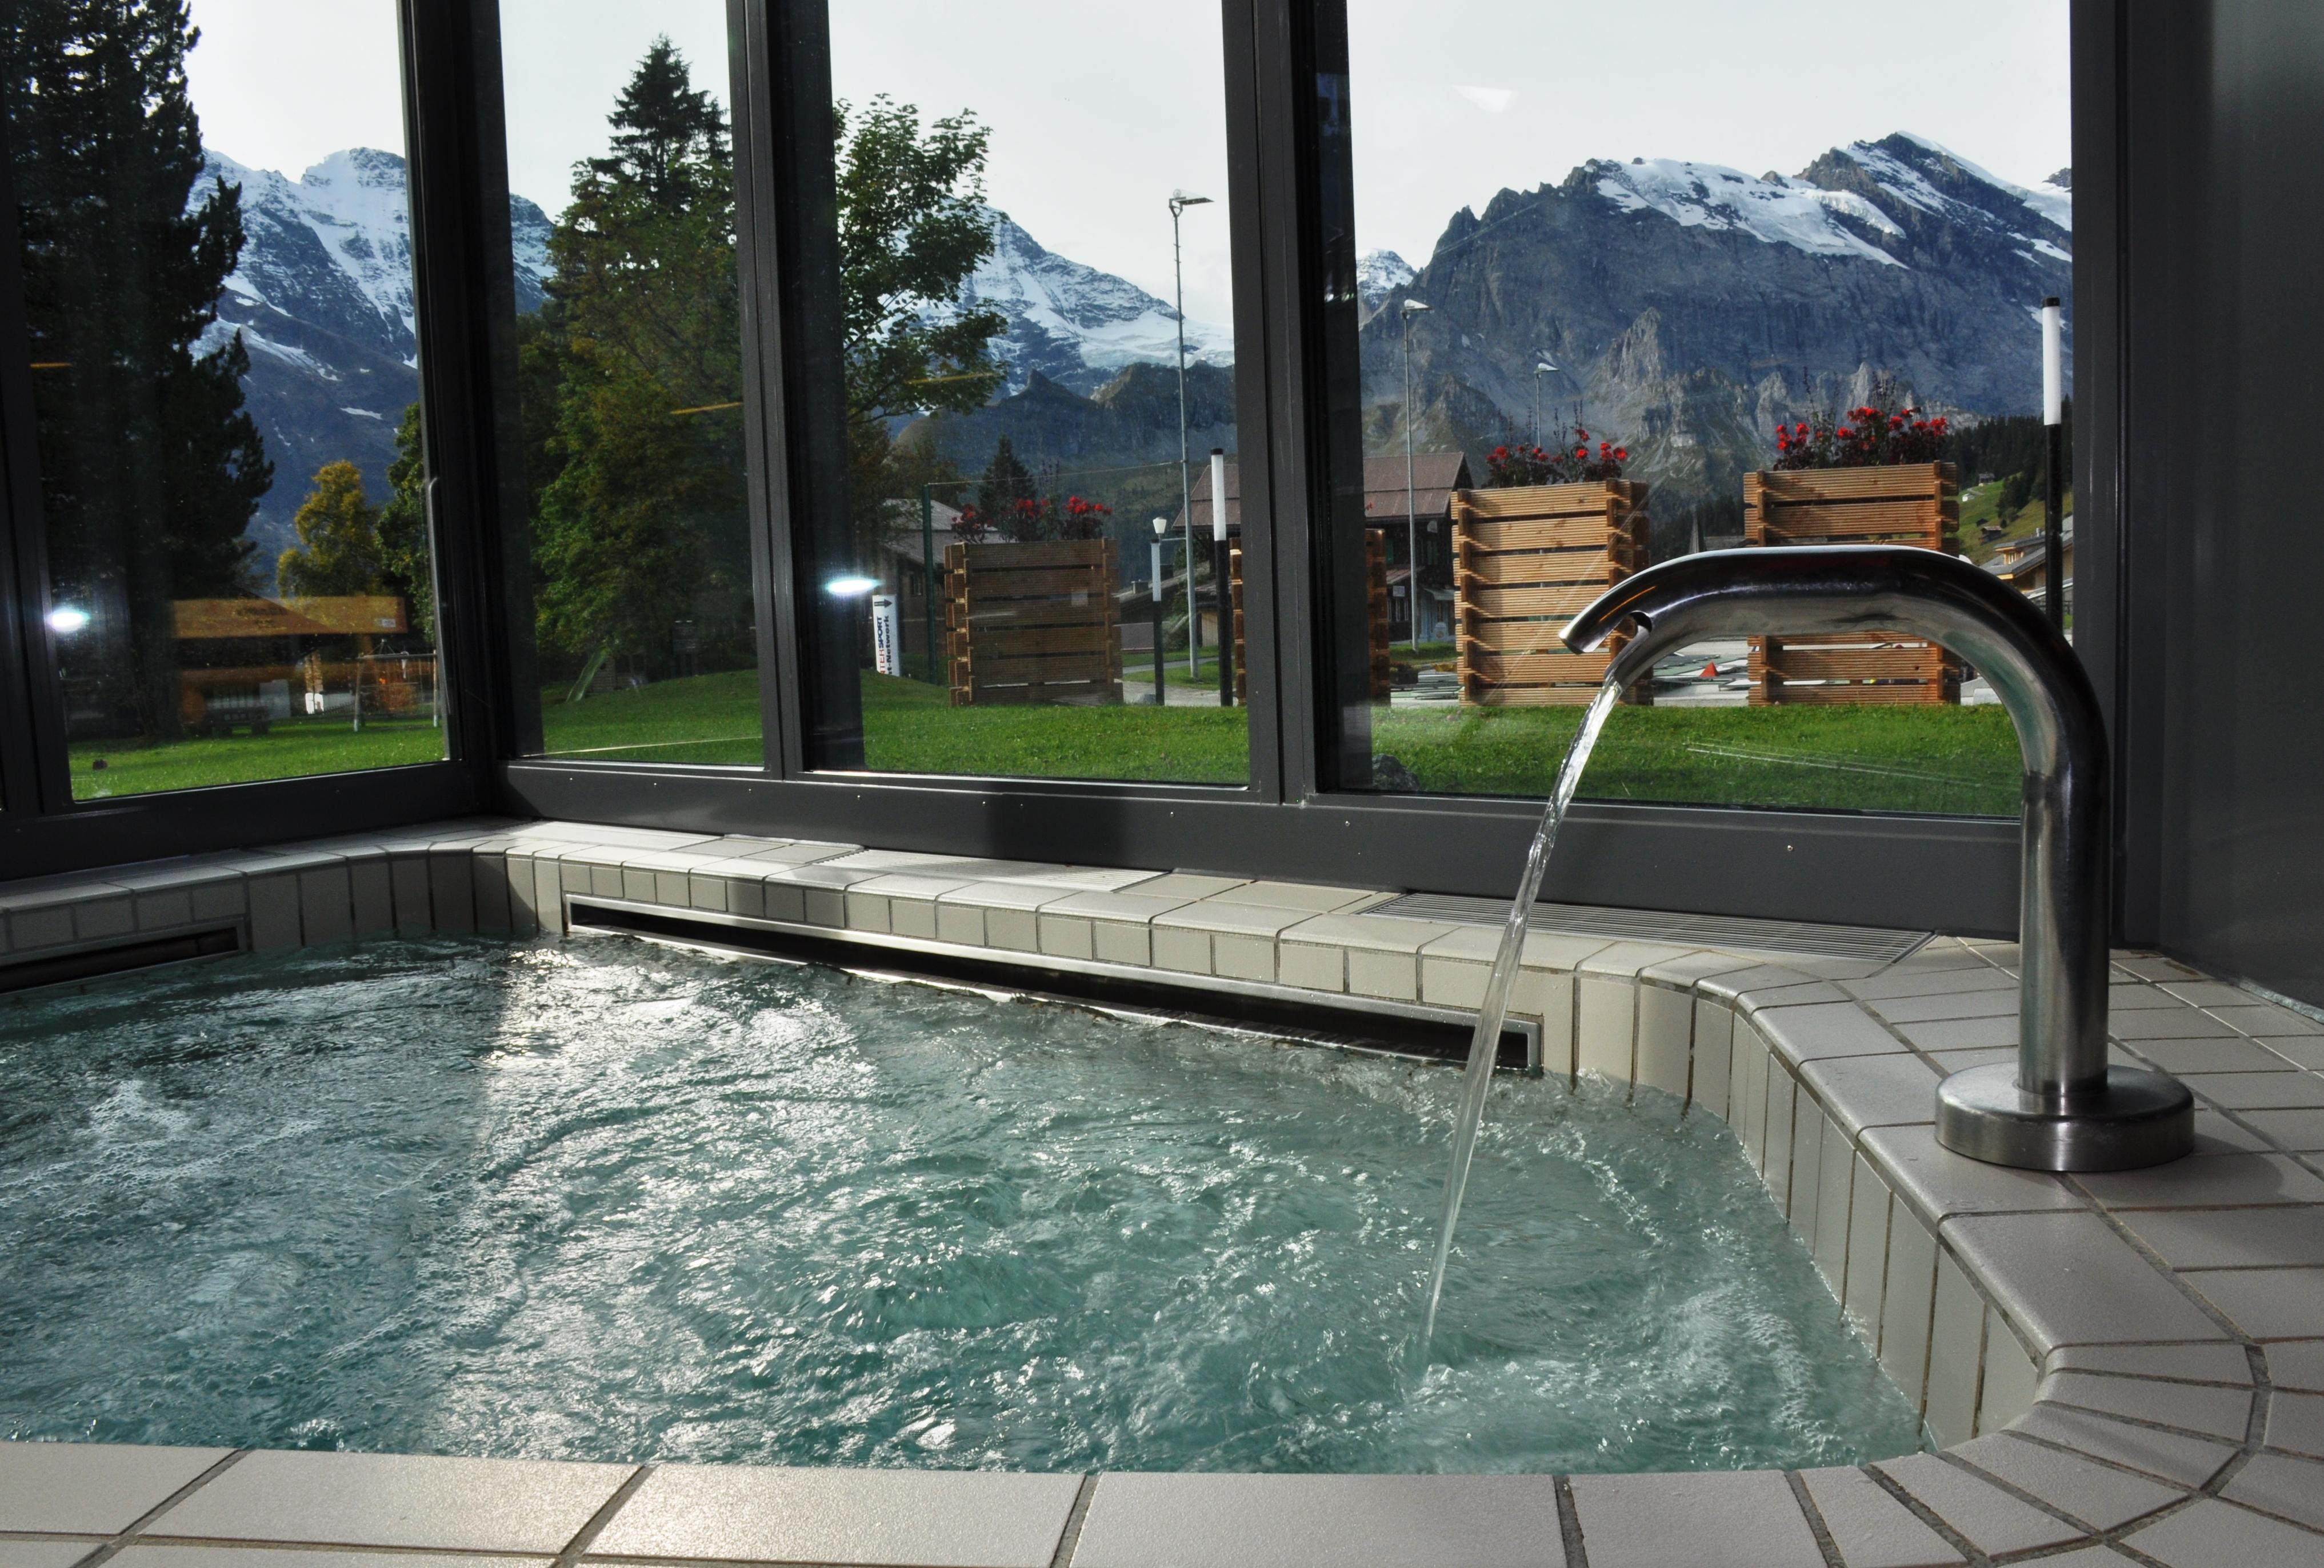 sprudelbad alpine spa wellness in den bergen. Black Bedroom Furniture Sets. Home Design Ideas